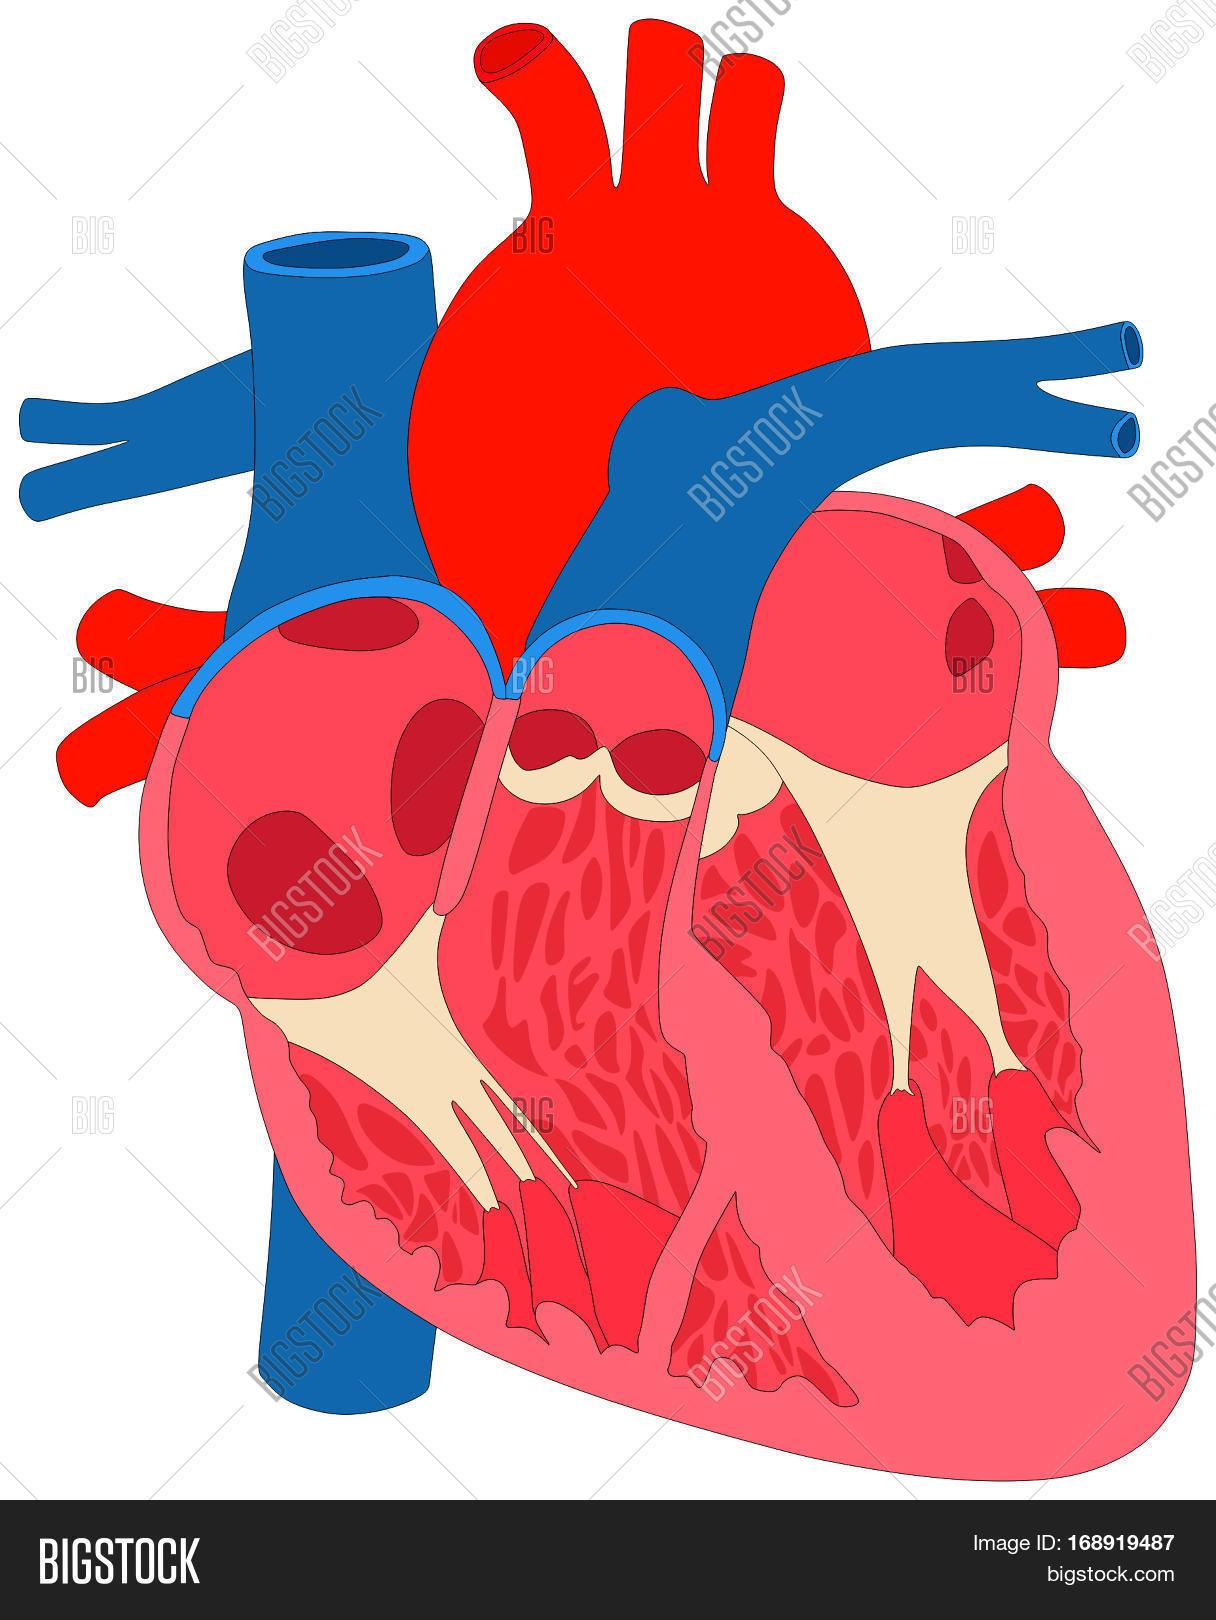 Human Heart Muscle Anatomy Cross Image & Photo | Bigstock